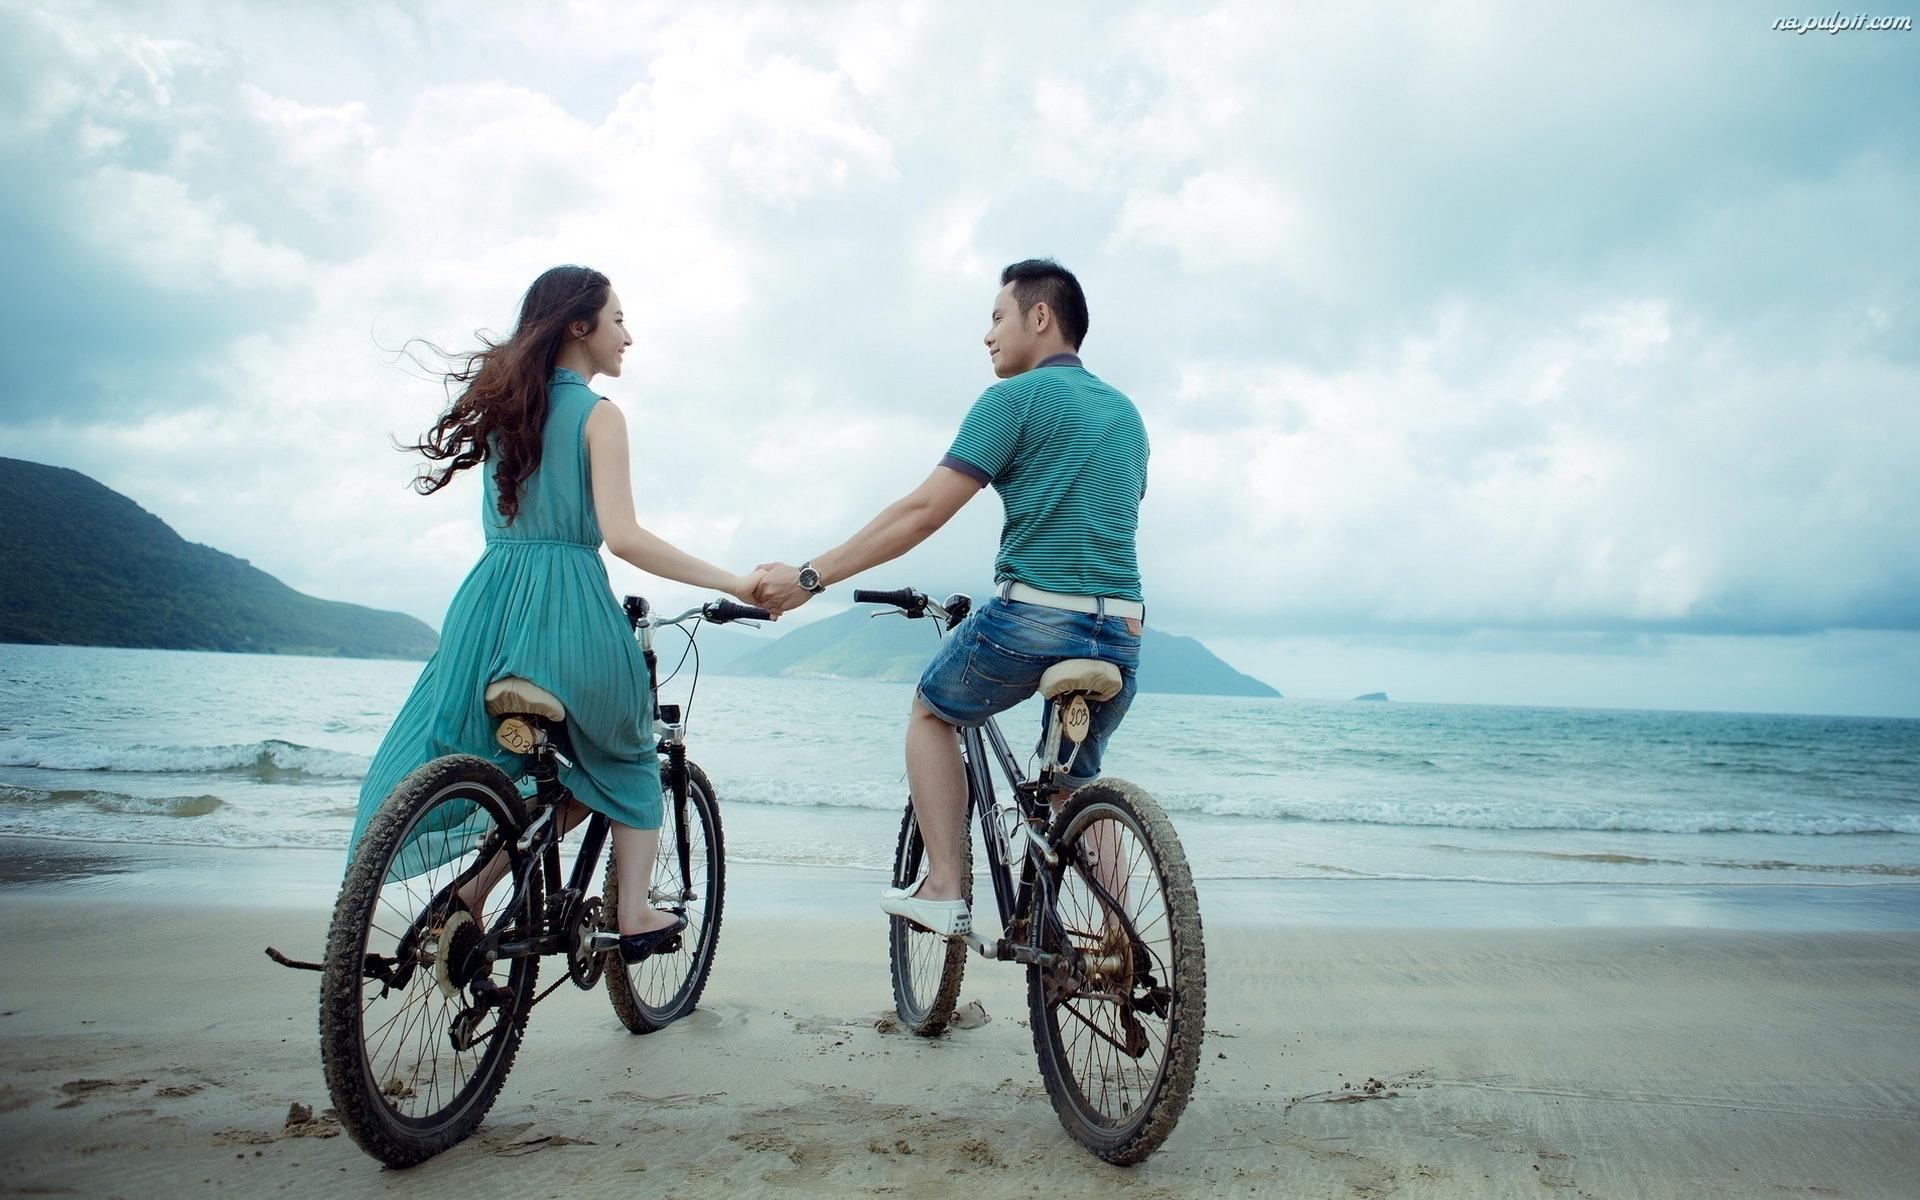 Rowery, Zakochani, Plaża